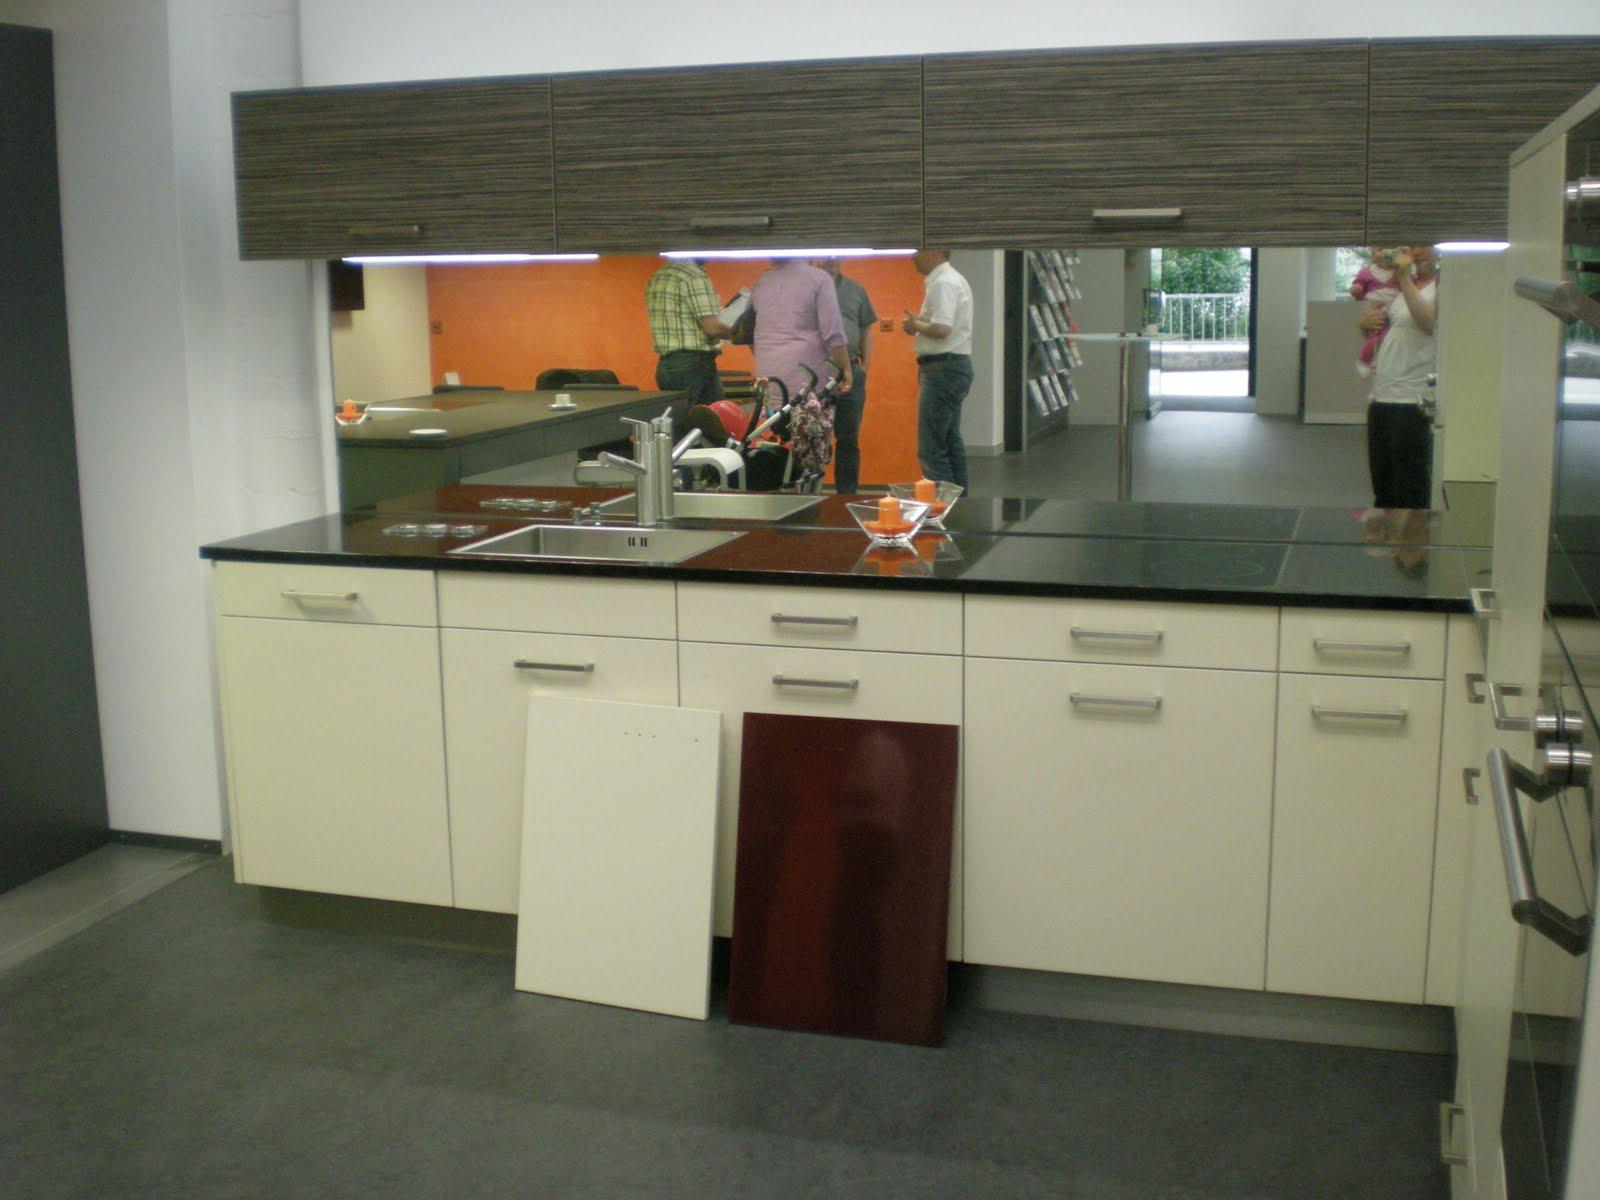 christa tom 39 s baublog welche farbe f r die k che. Black Bedroom Furniture Sets. Home Design Ideas